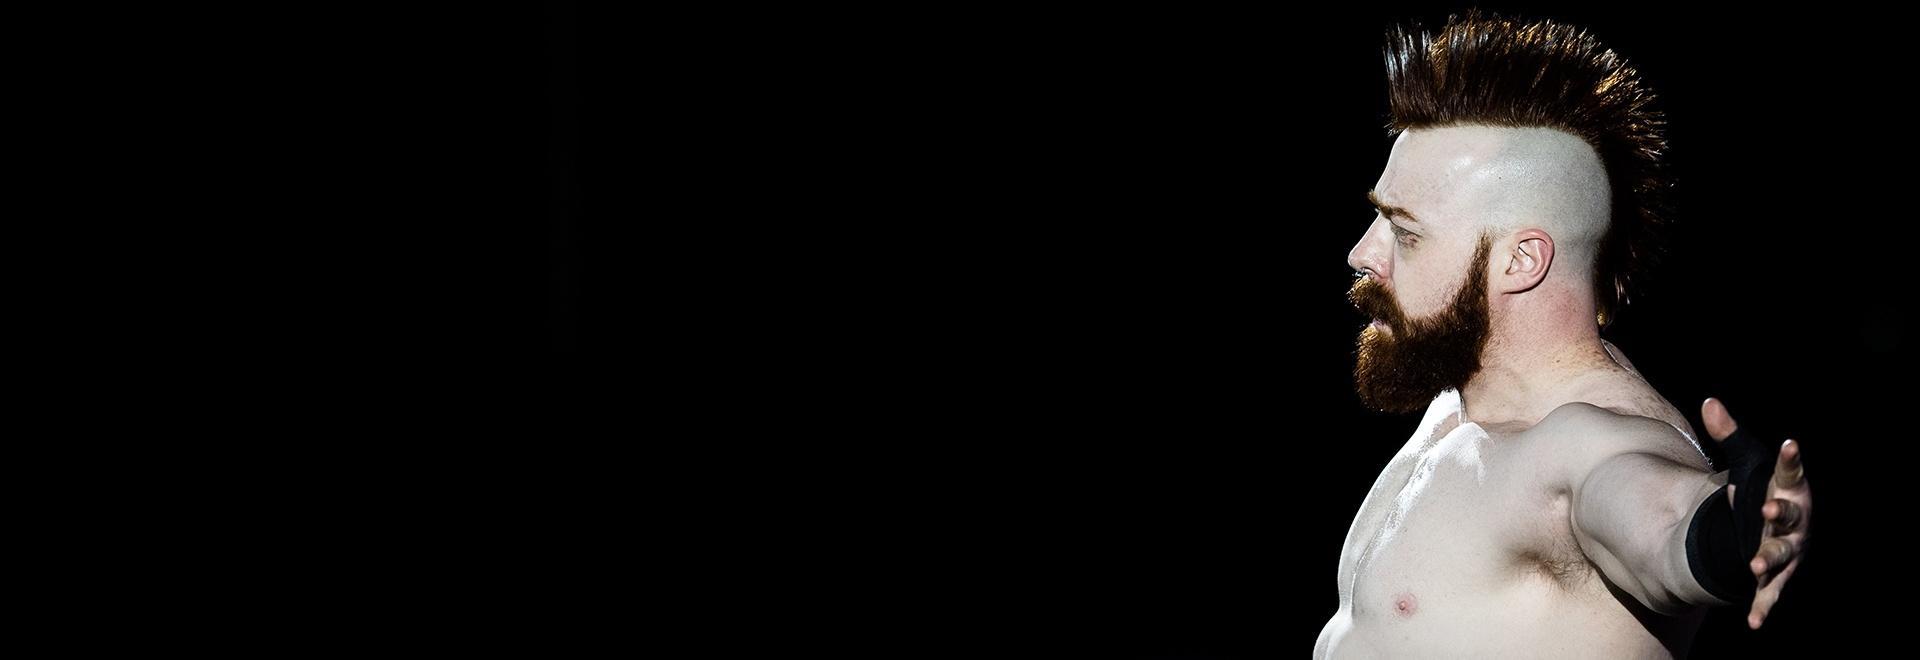 Ep. 52